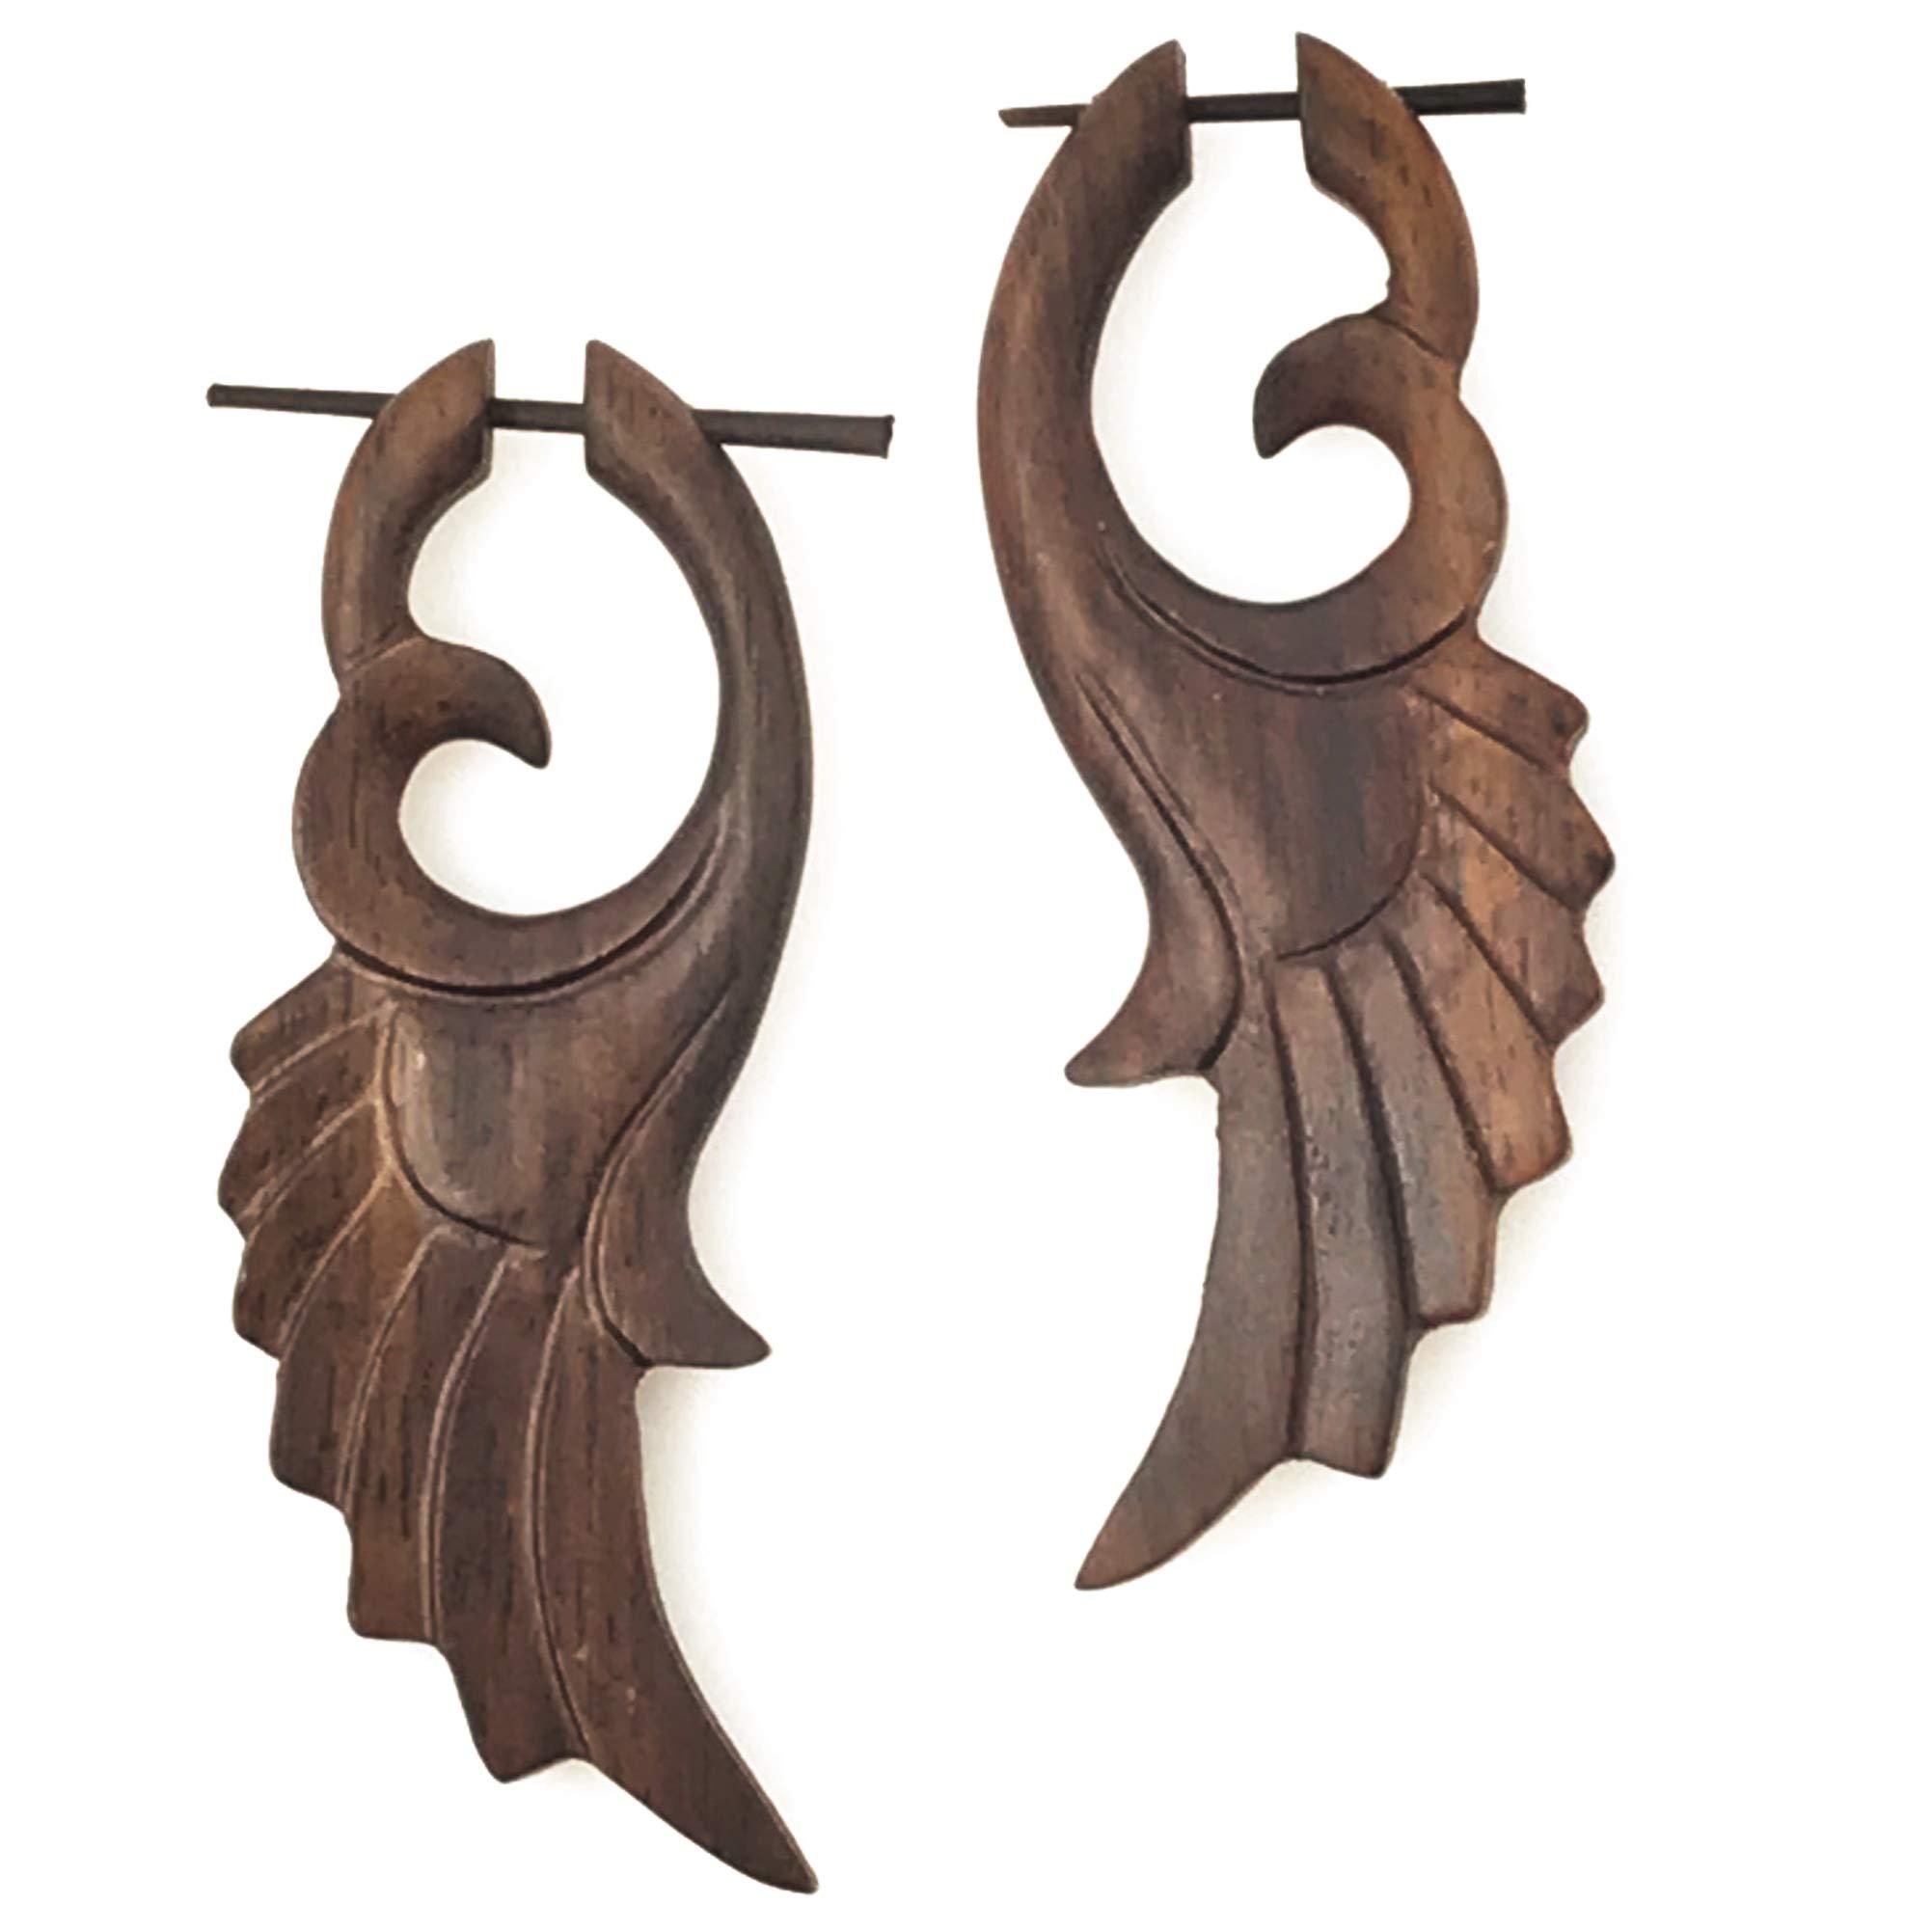 UMBRELLALABORATORY Tribal Organics Earrings Wooden Tropical Feathered Bird Style Fake Gauges W 13